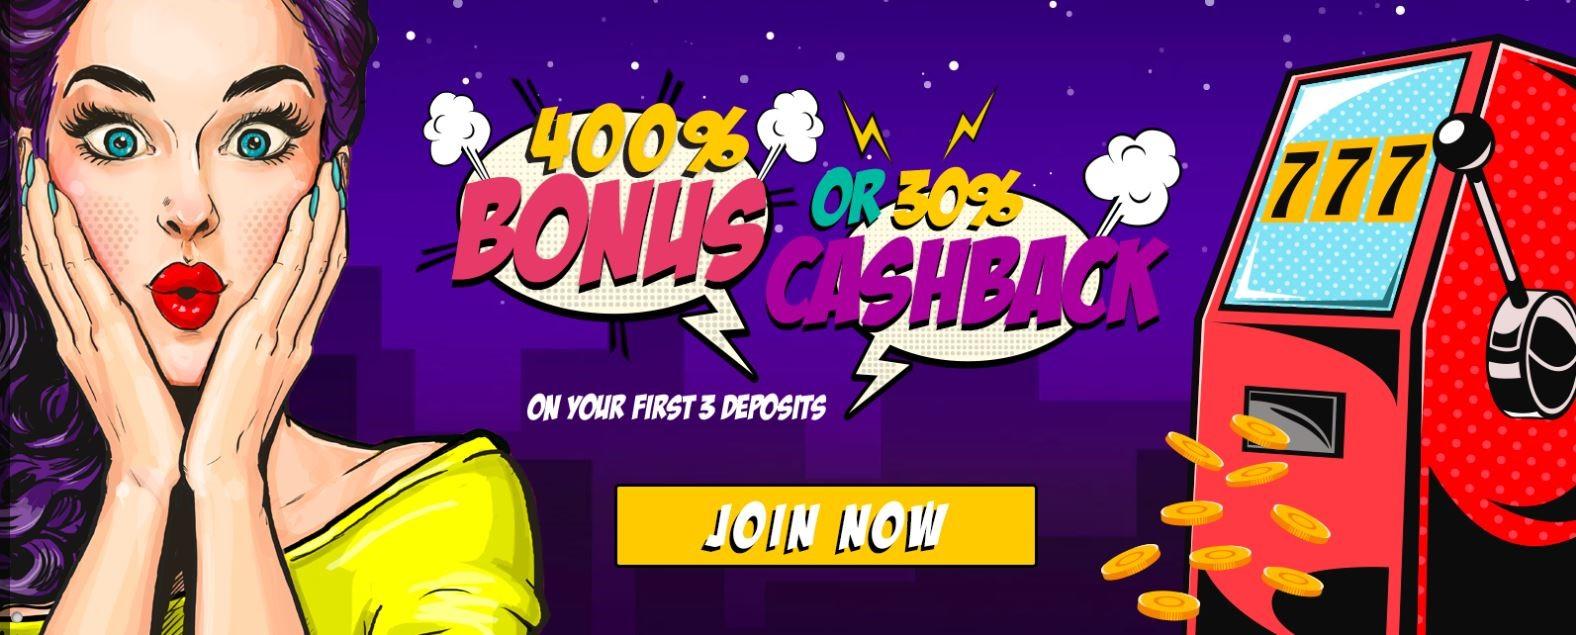 fantastik casino